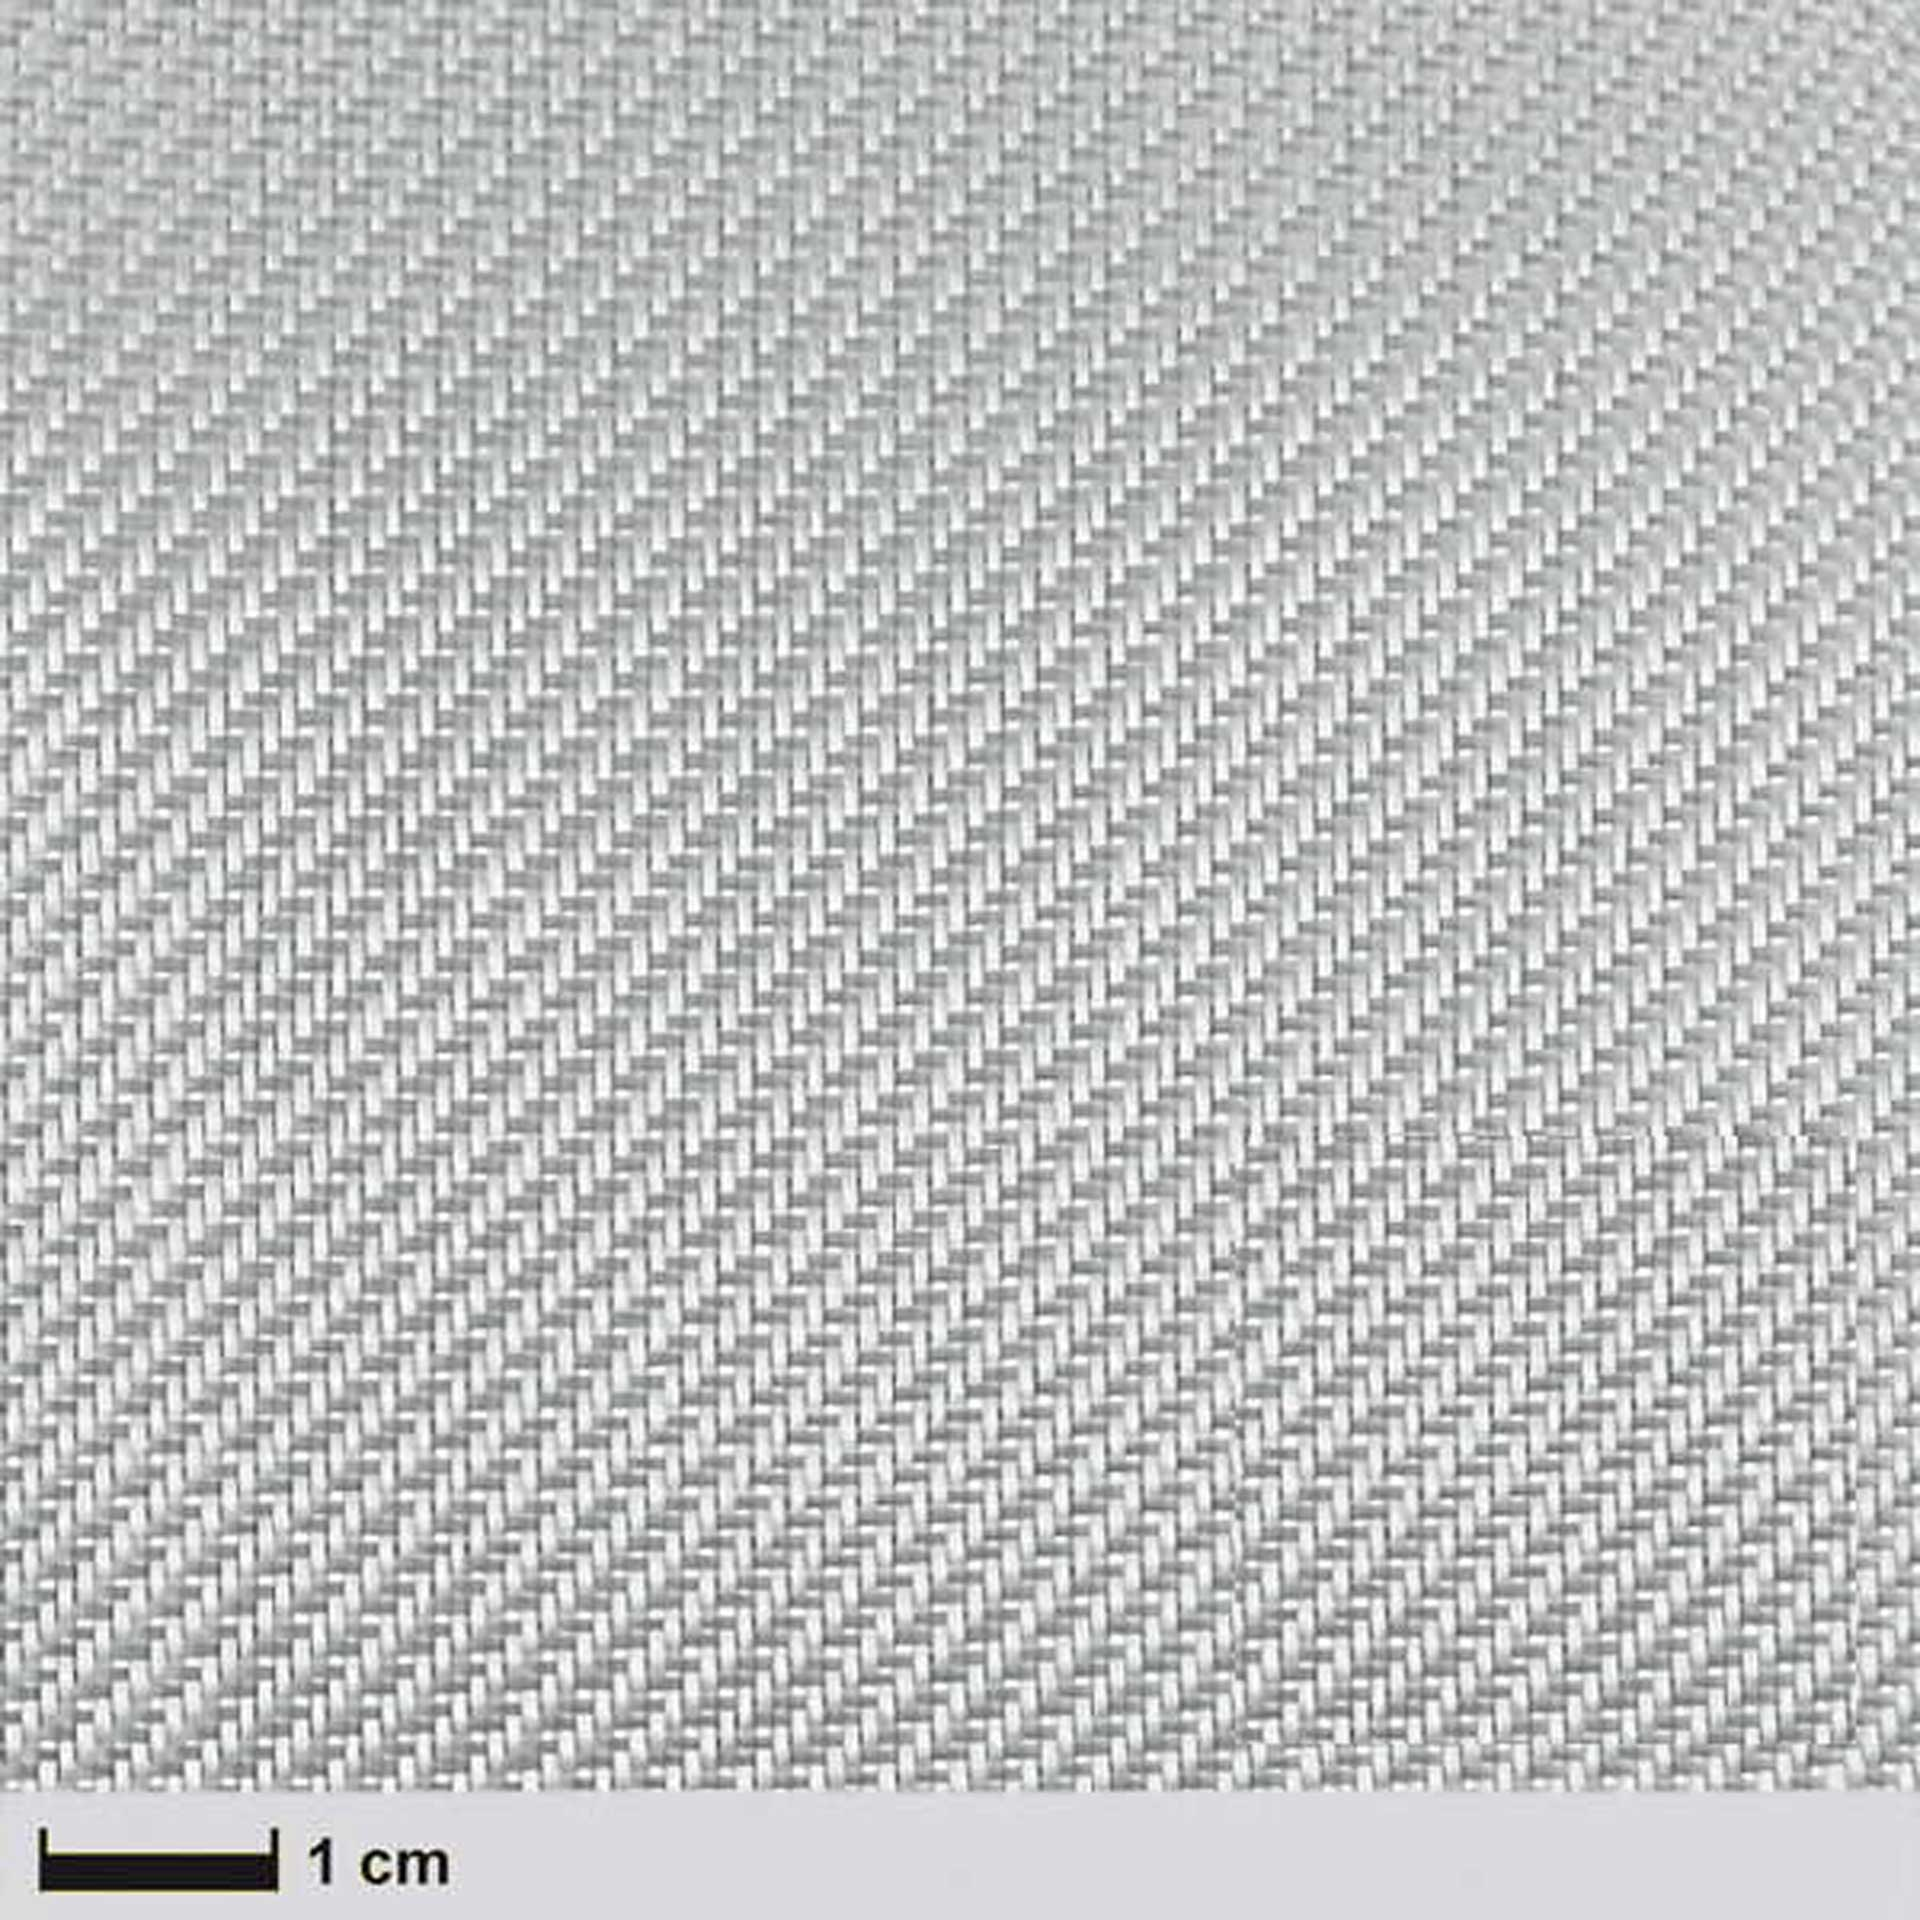 R&G Glasgewebe 160 g/m² (Köper) 100 cm, Rolle/ 5 m